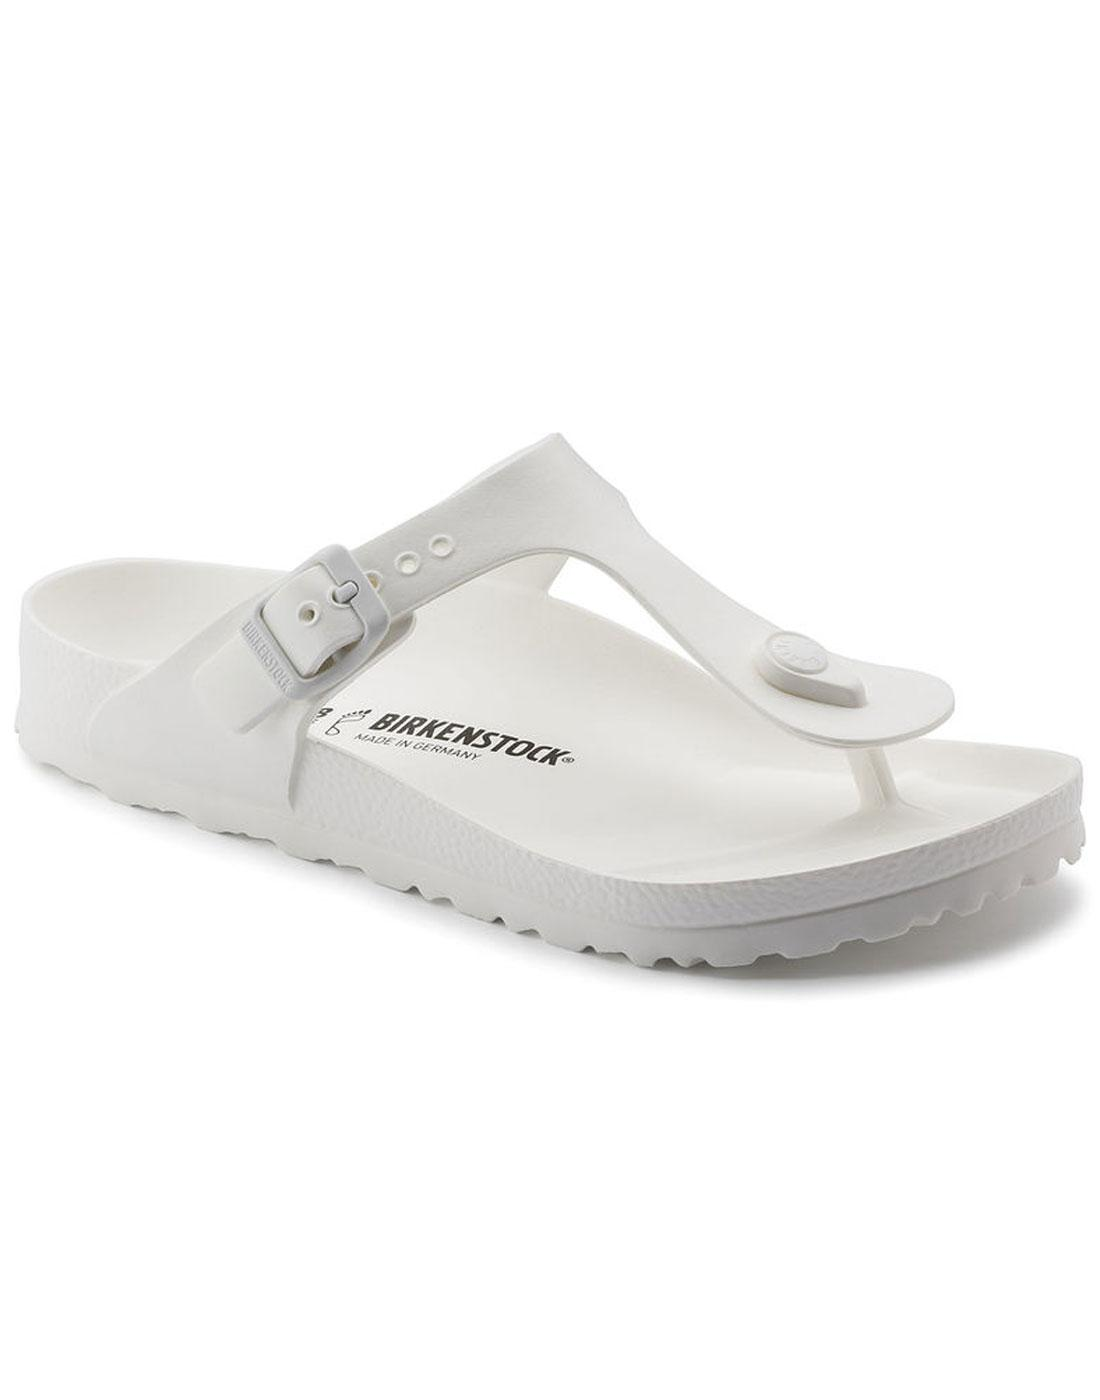 Gizeh EVA BIRKENSTOCK Ultra Lite Thong Sandals (W)